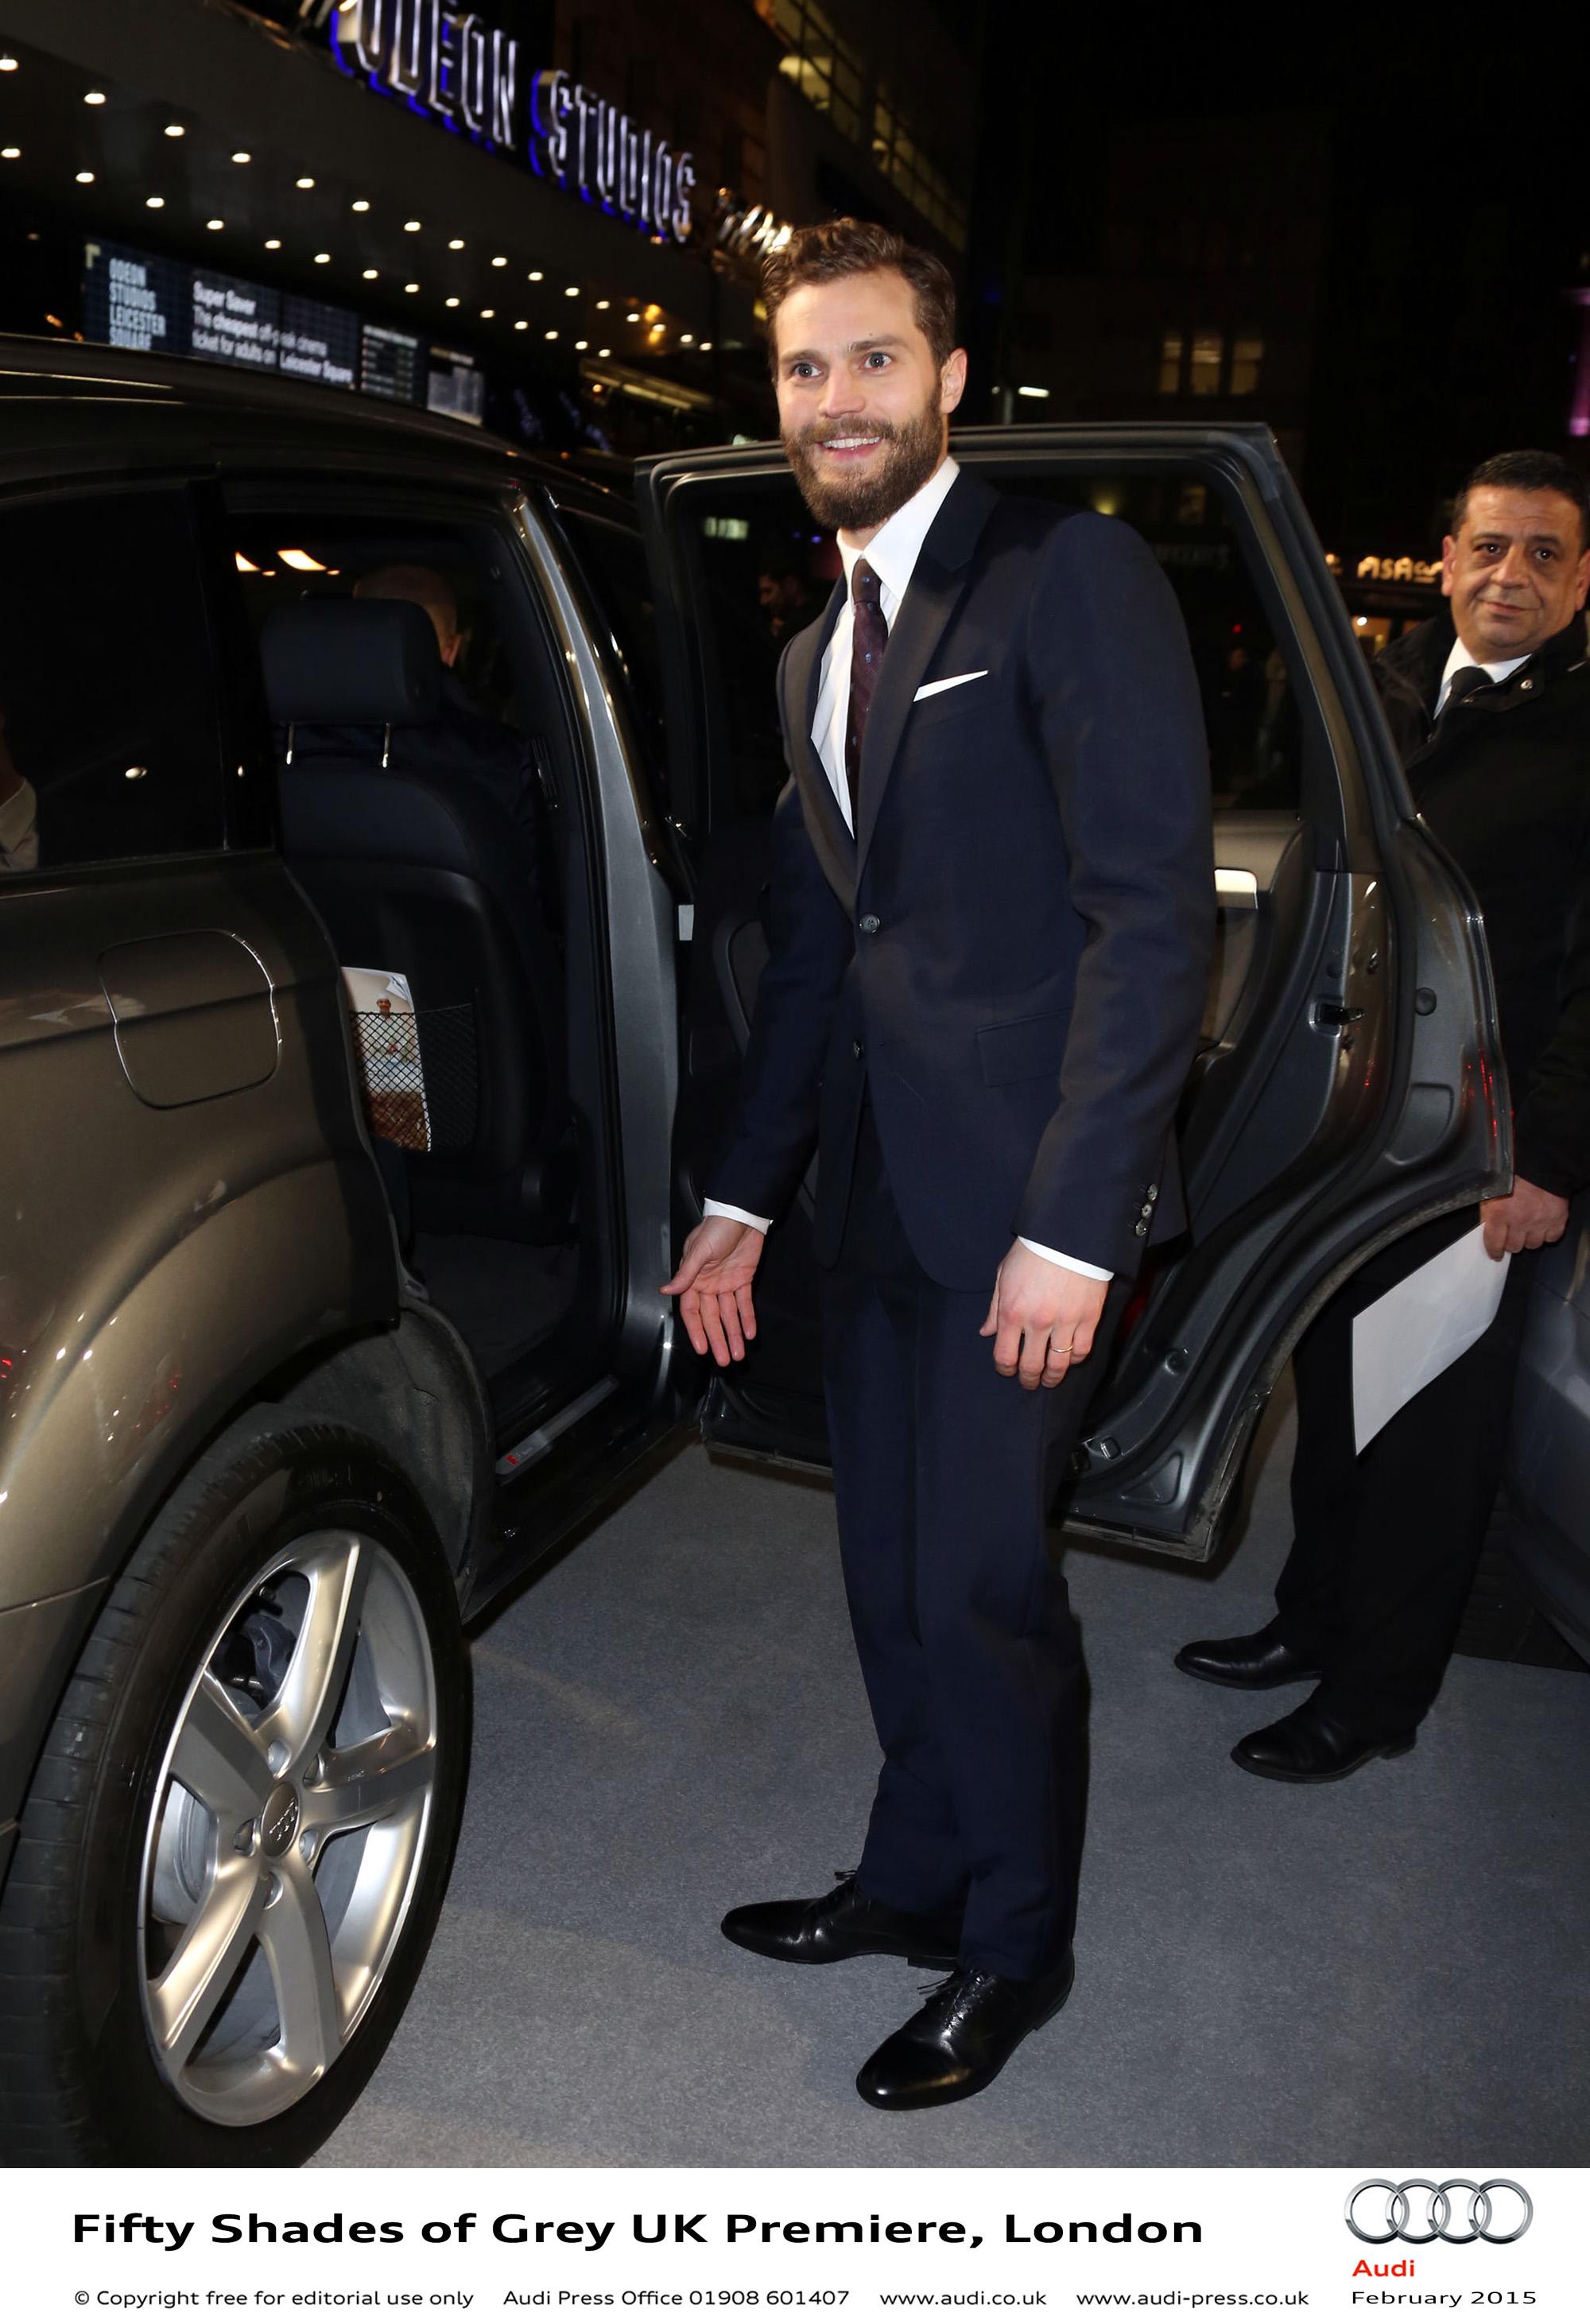 Jamie Dornan - Fifty Shades of Grey Premiere